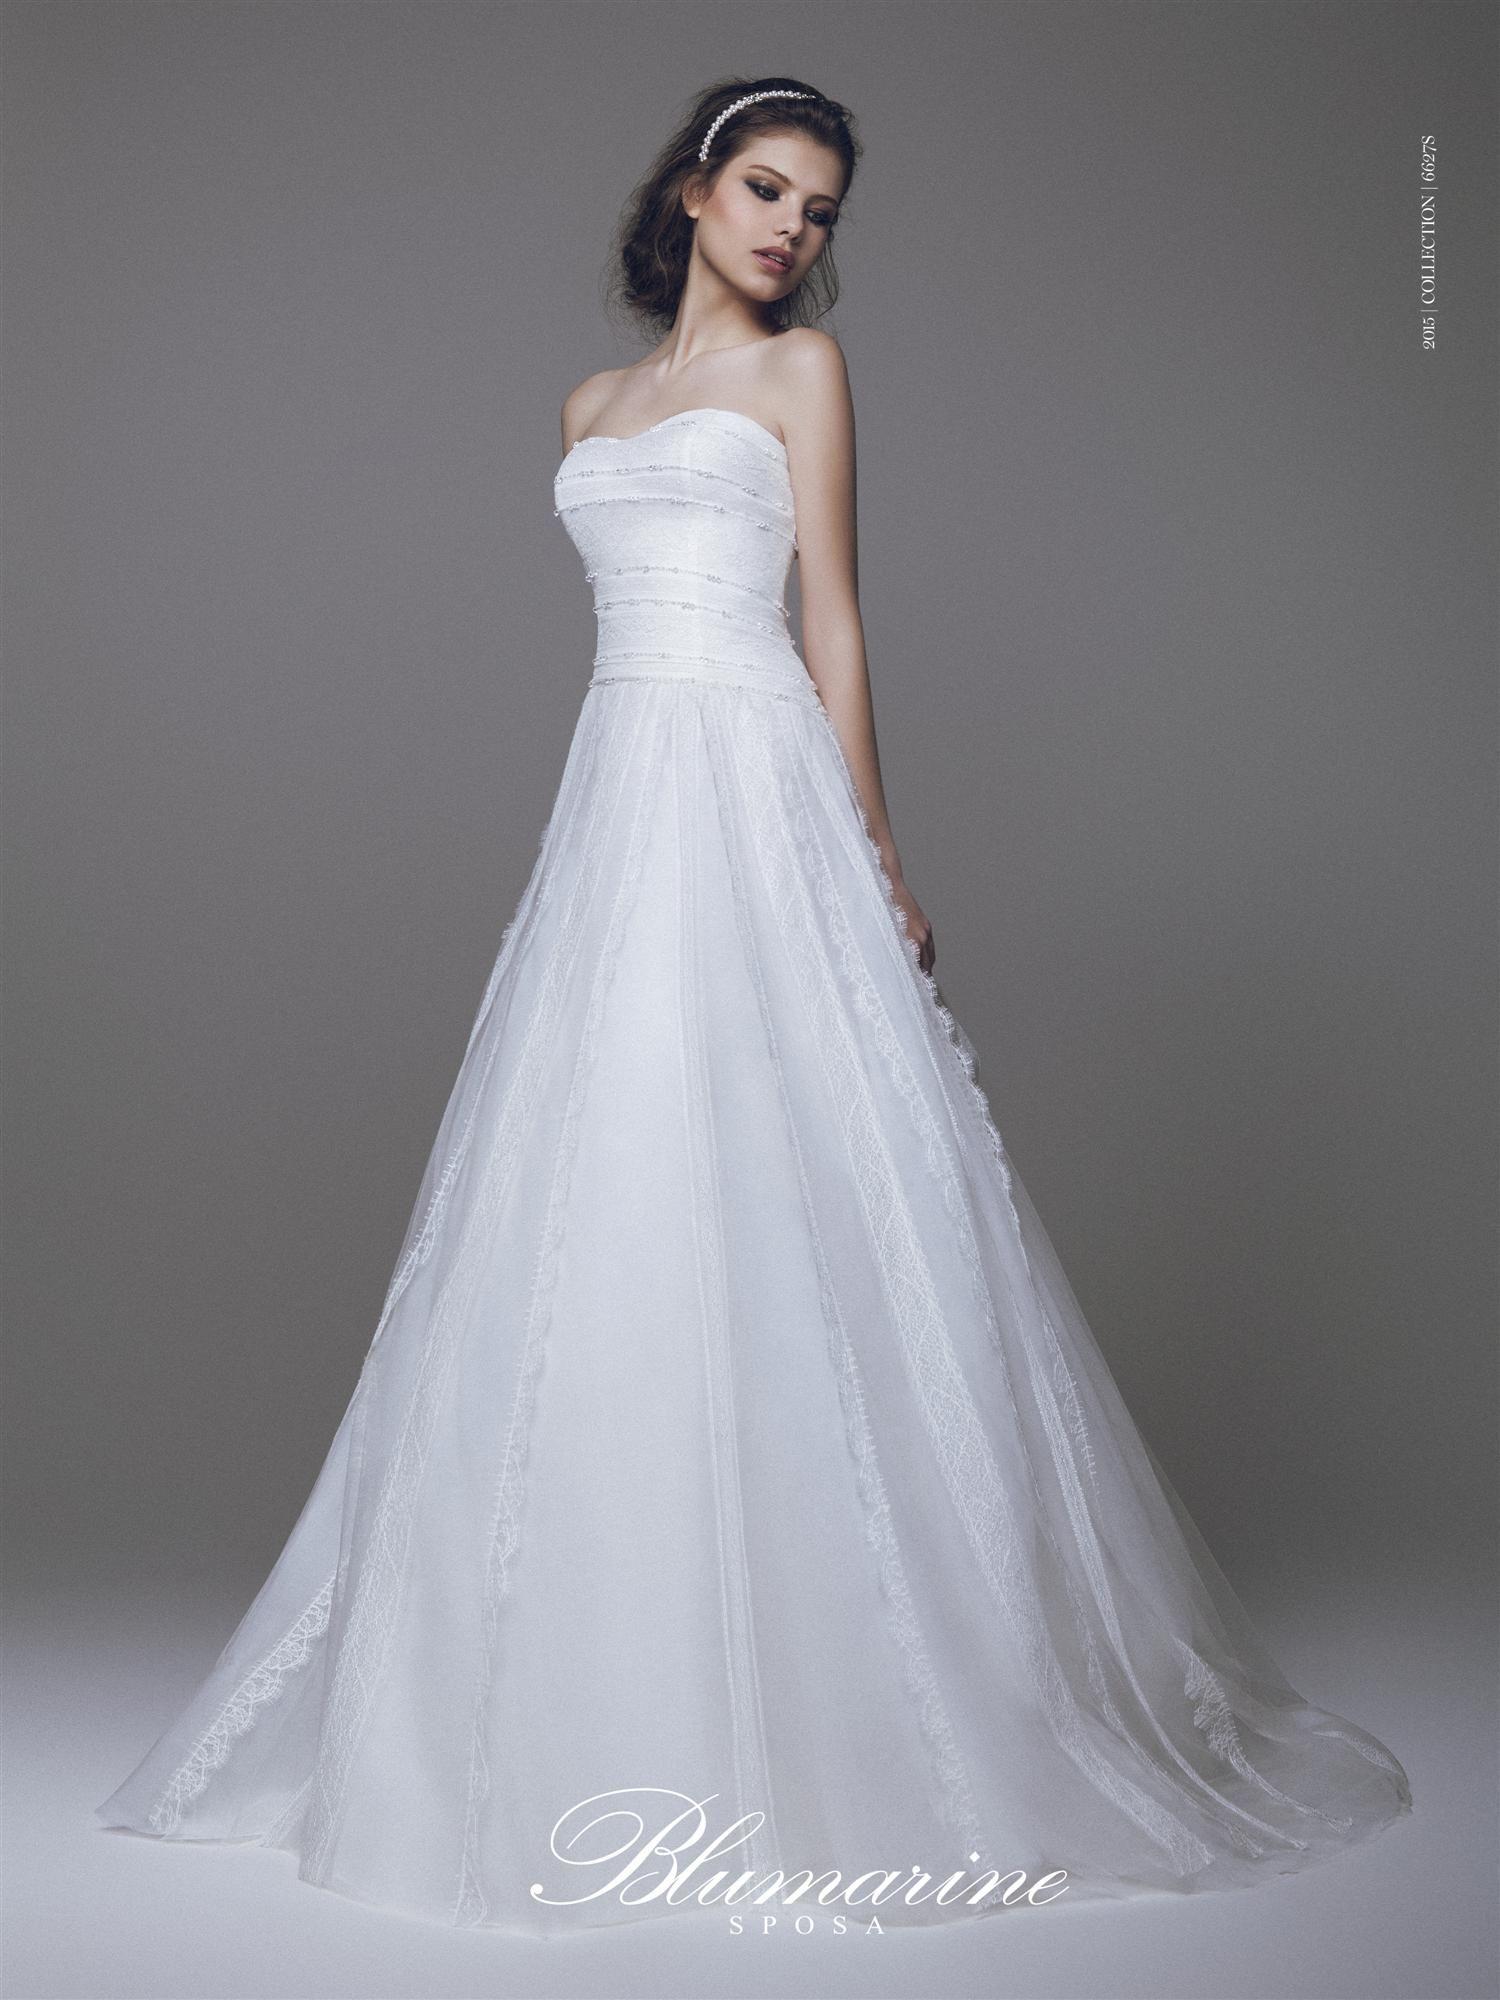 Blumarine sposa wedding gown love pinterest gowns and